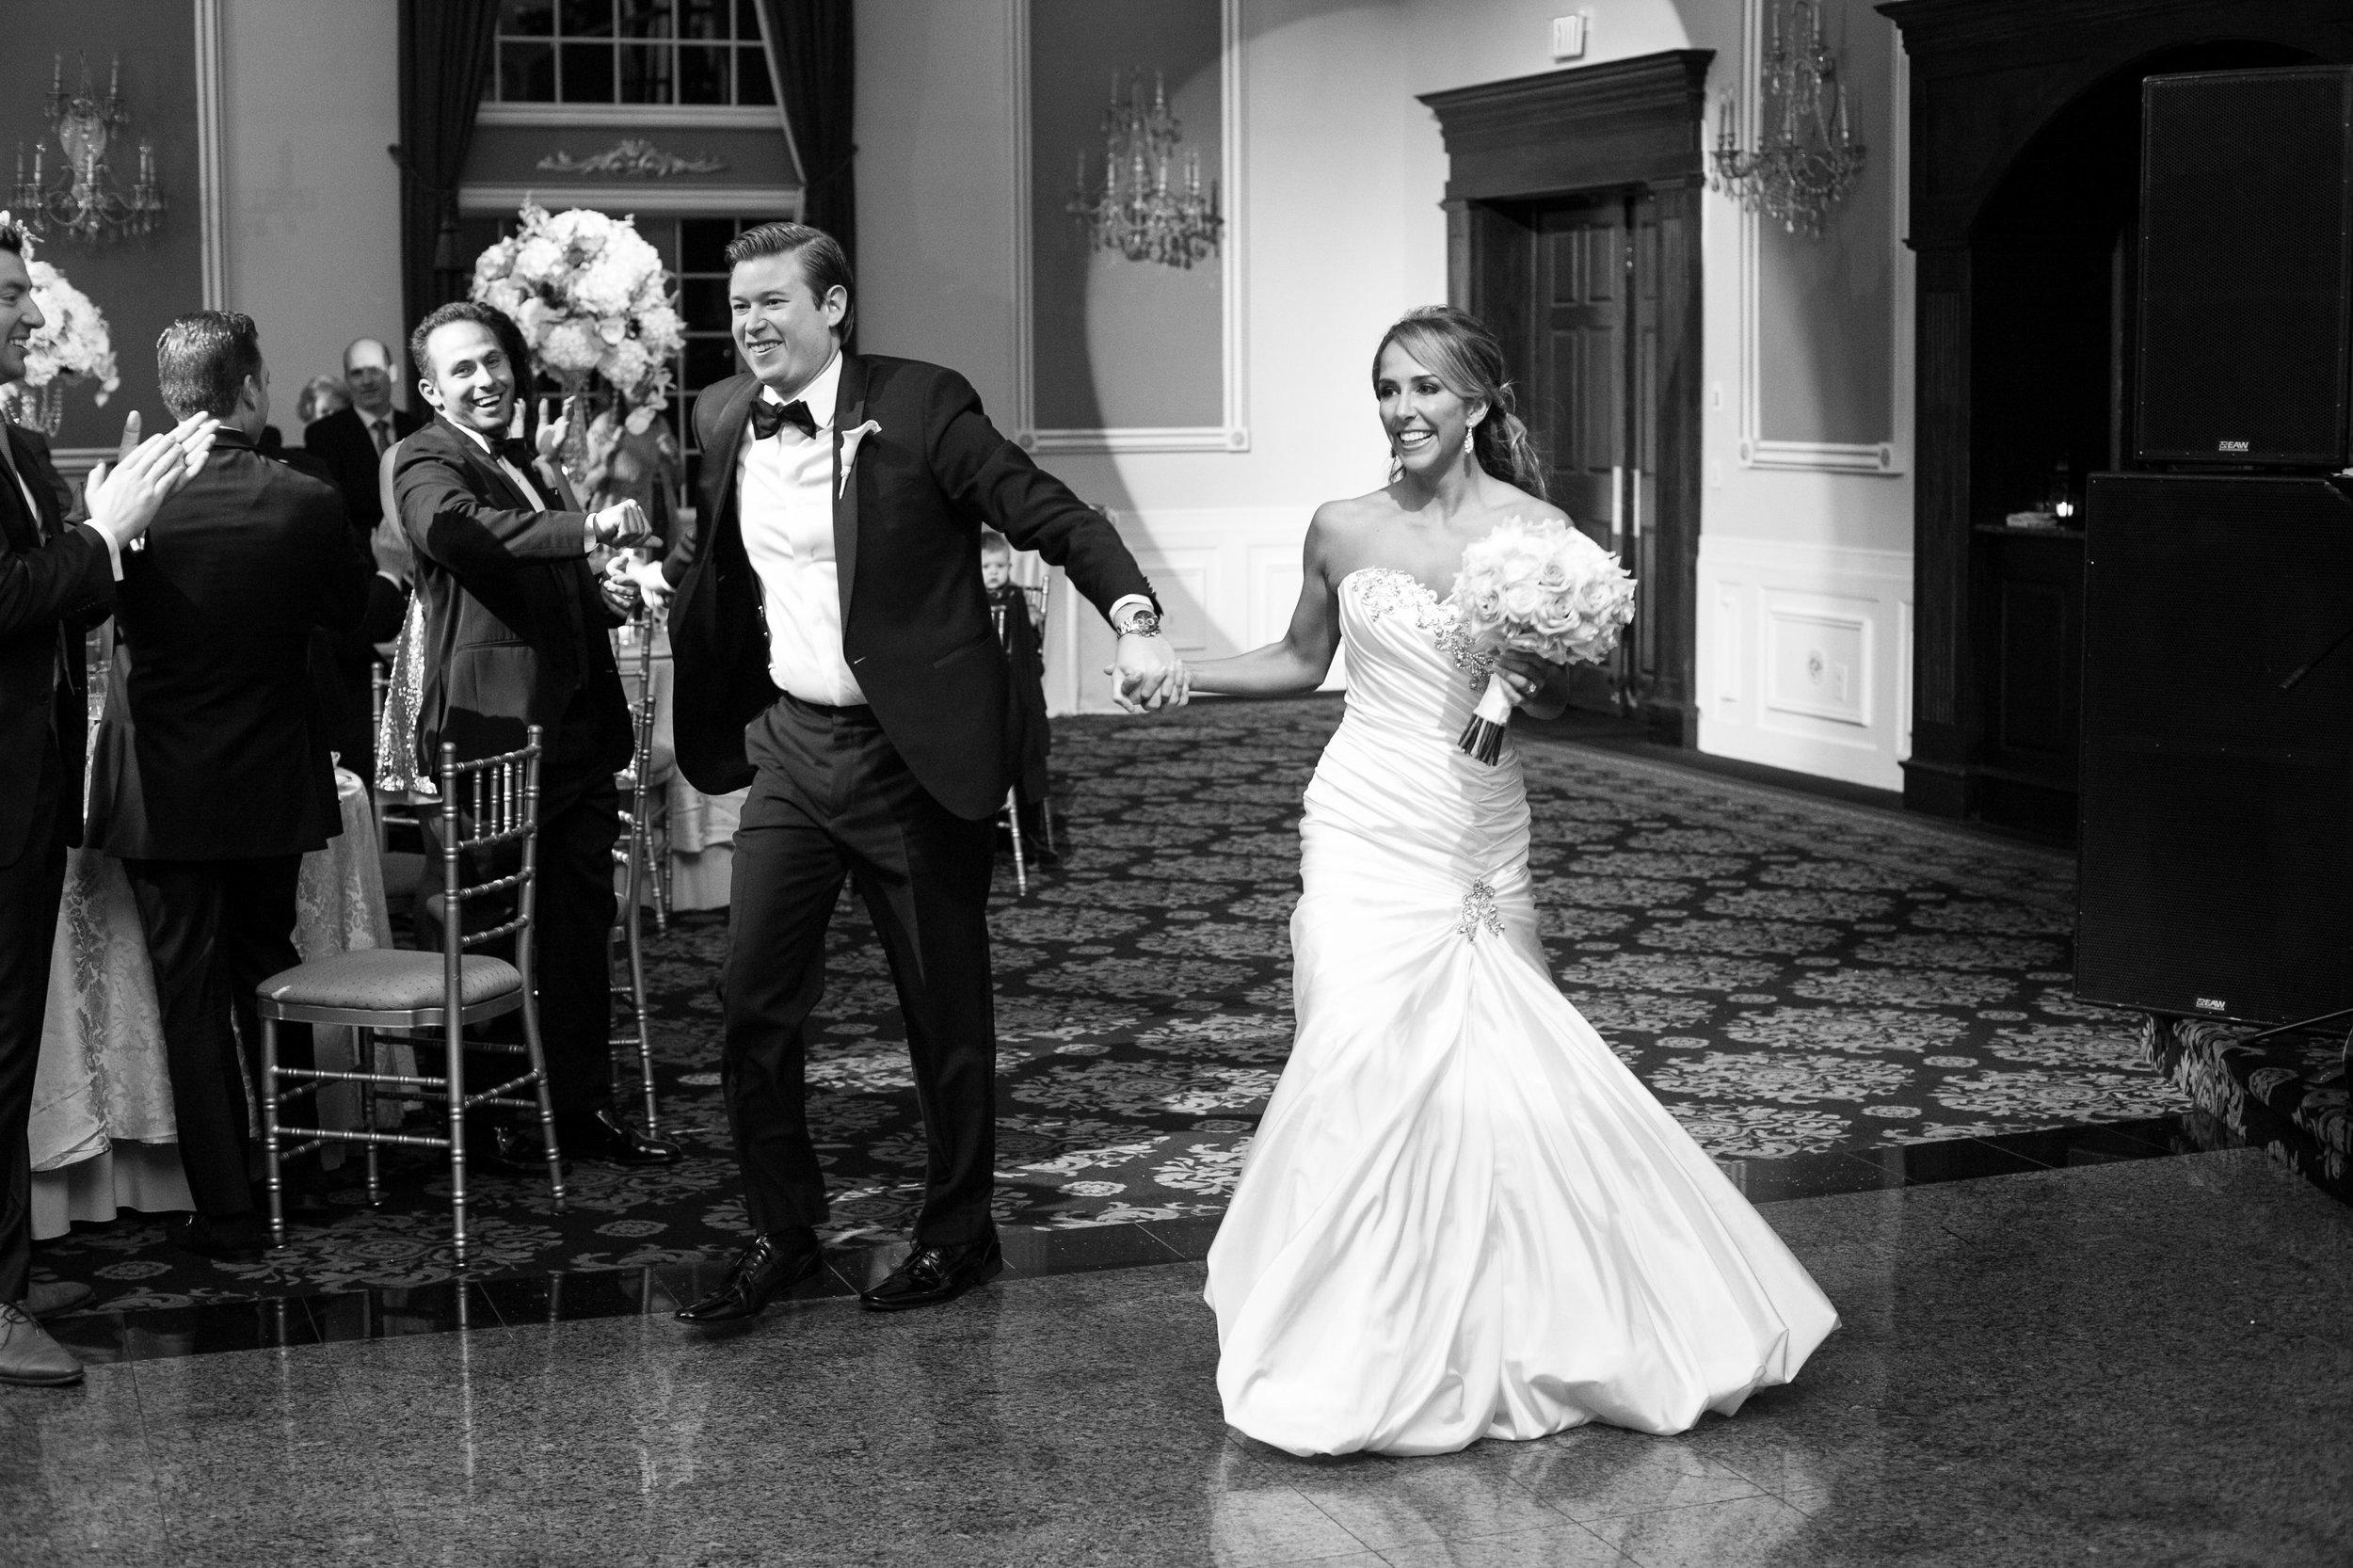 Ceci_New_York_Custom_Invitation_ New_Jersey_Wedding_Luxury_Personalized_Ceci_Style_Bride_Foil_Stamping162.JPG